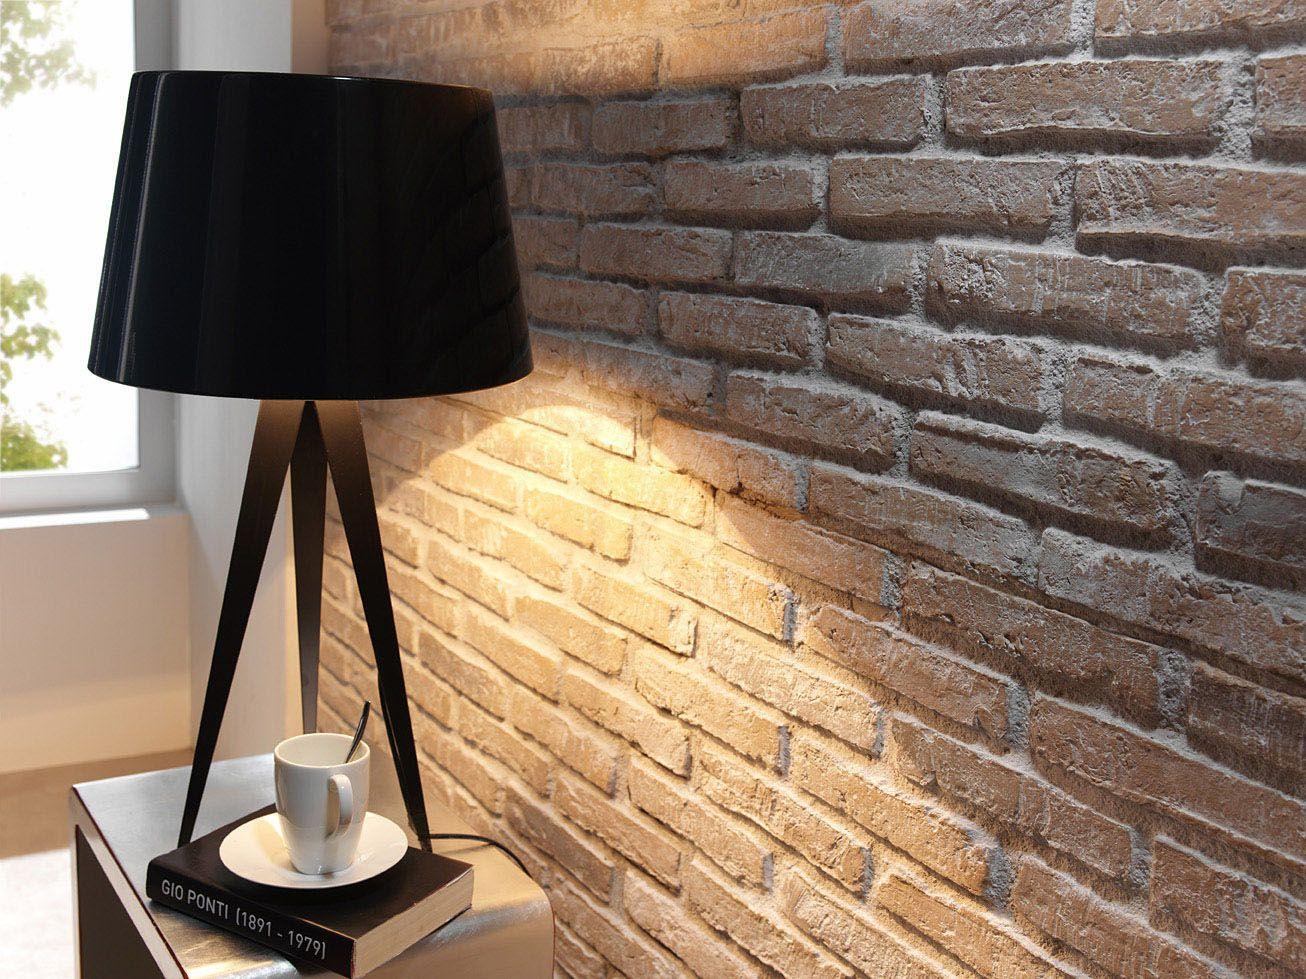 Panel Piedra Ladrillo rustico blanco | cuevita | Pinterest | Salons ...